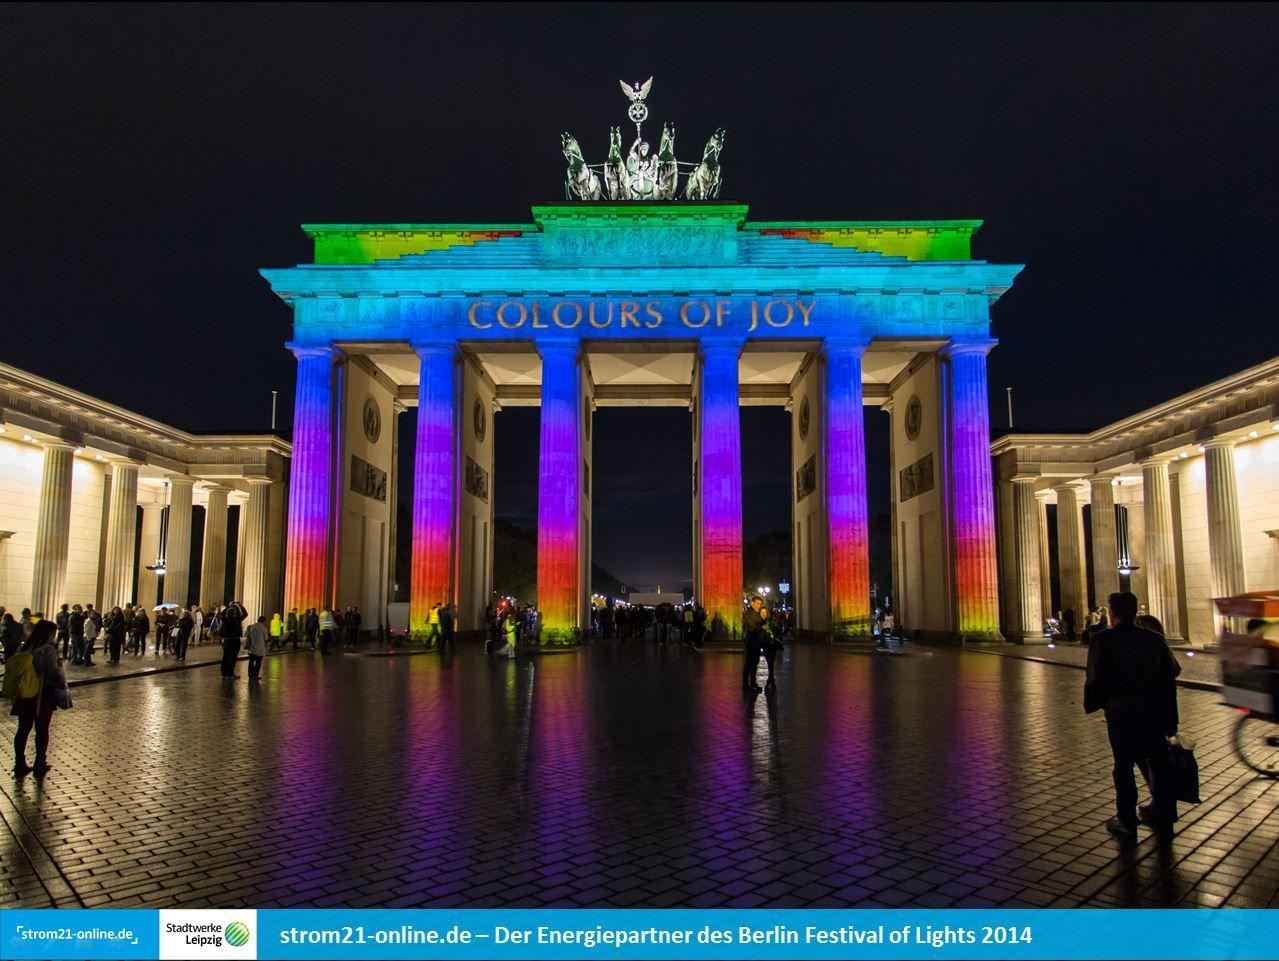 #BrandenburgerTor